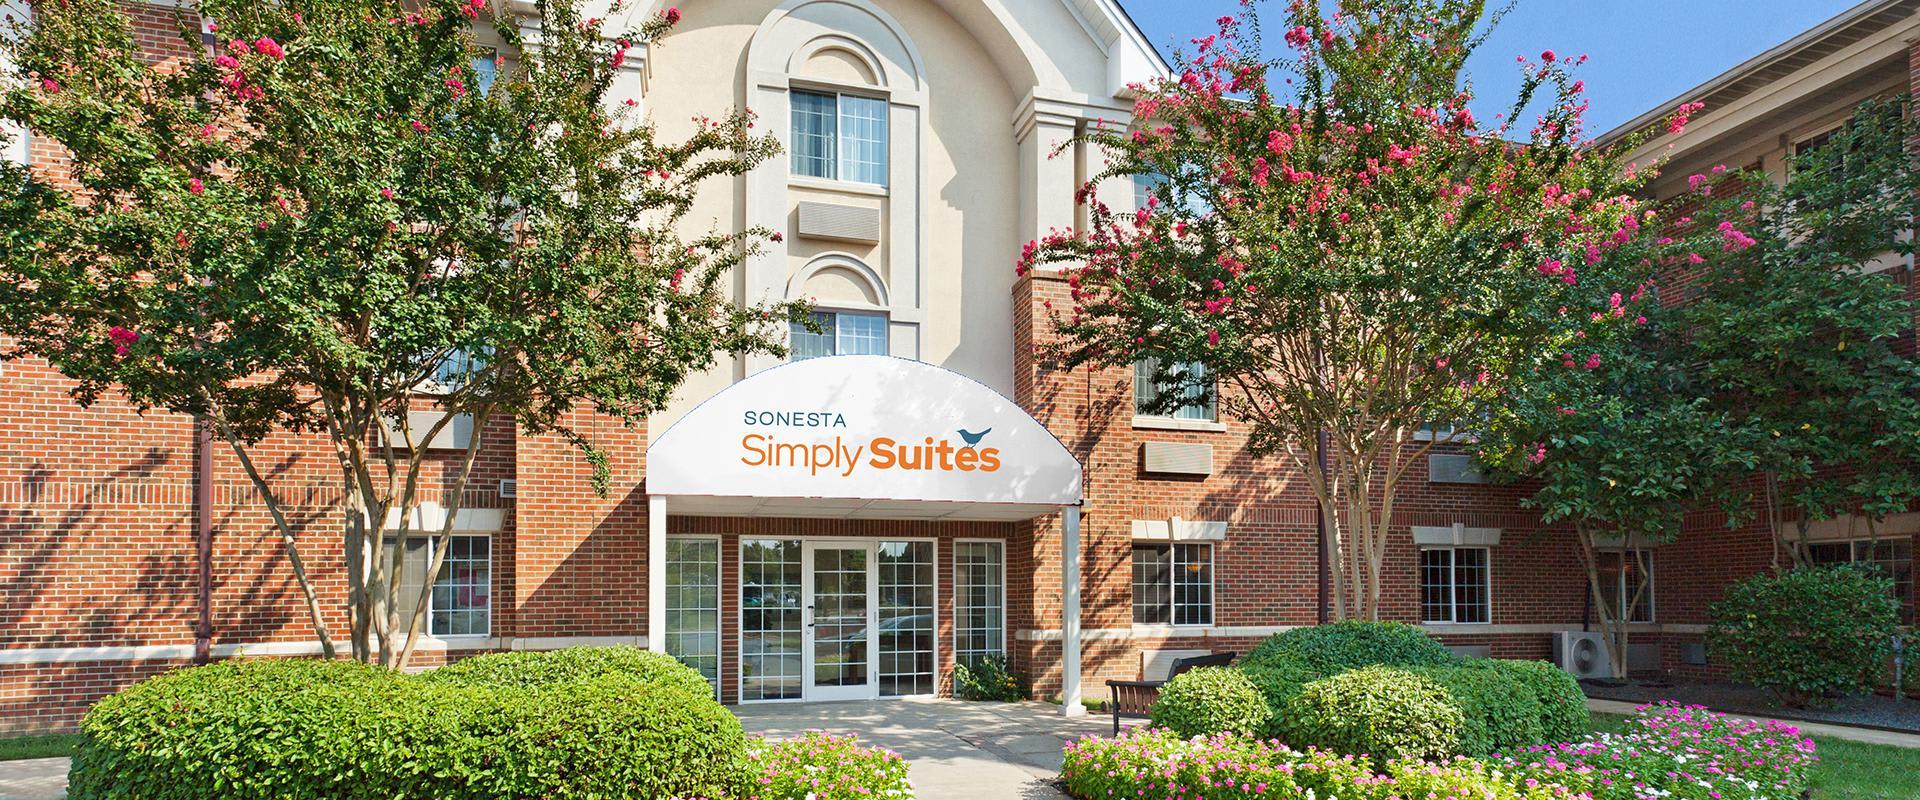 Sonesta Simply Suites Charlotte University Hotel Exterior Entrance